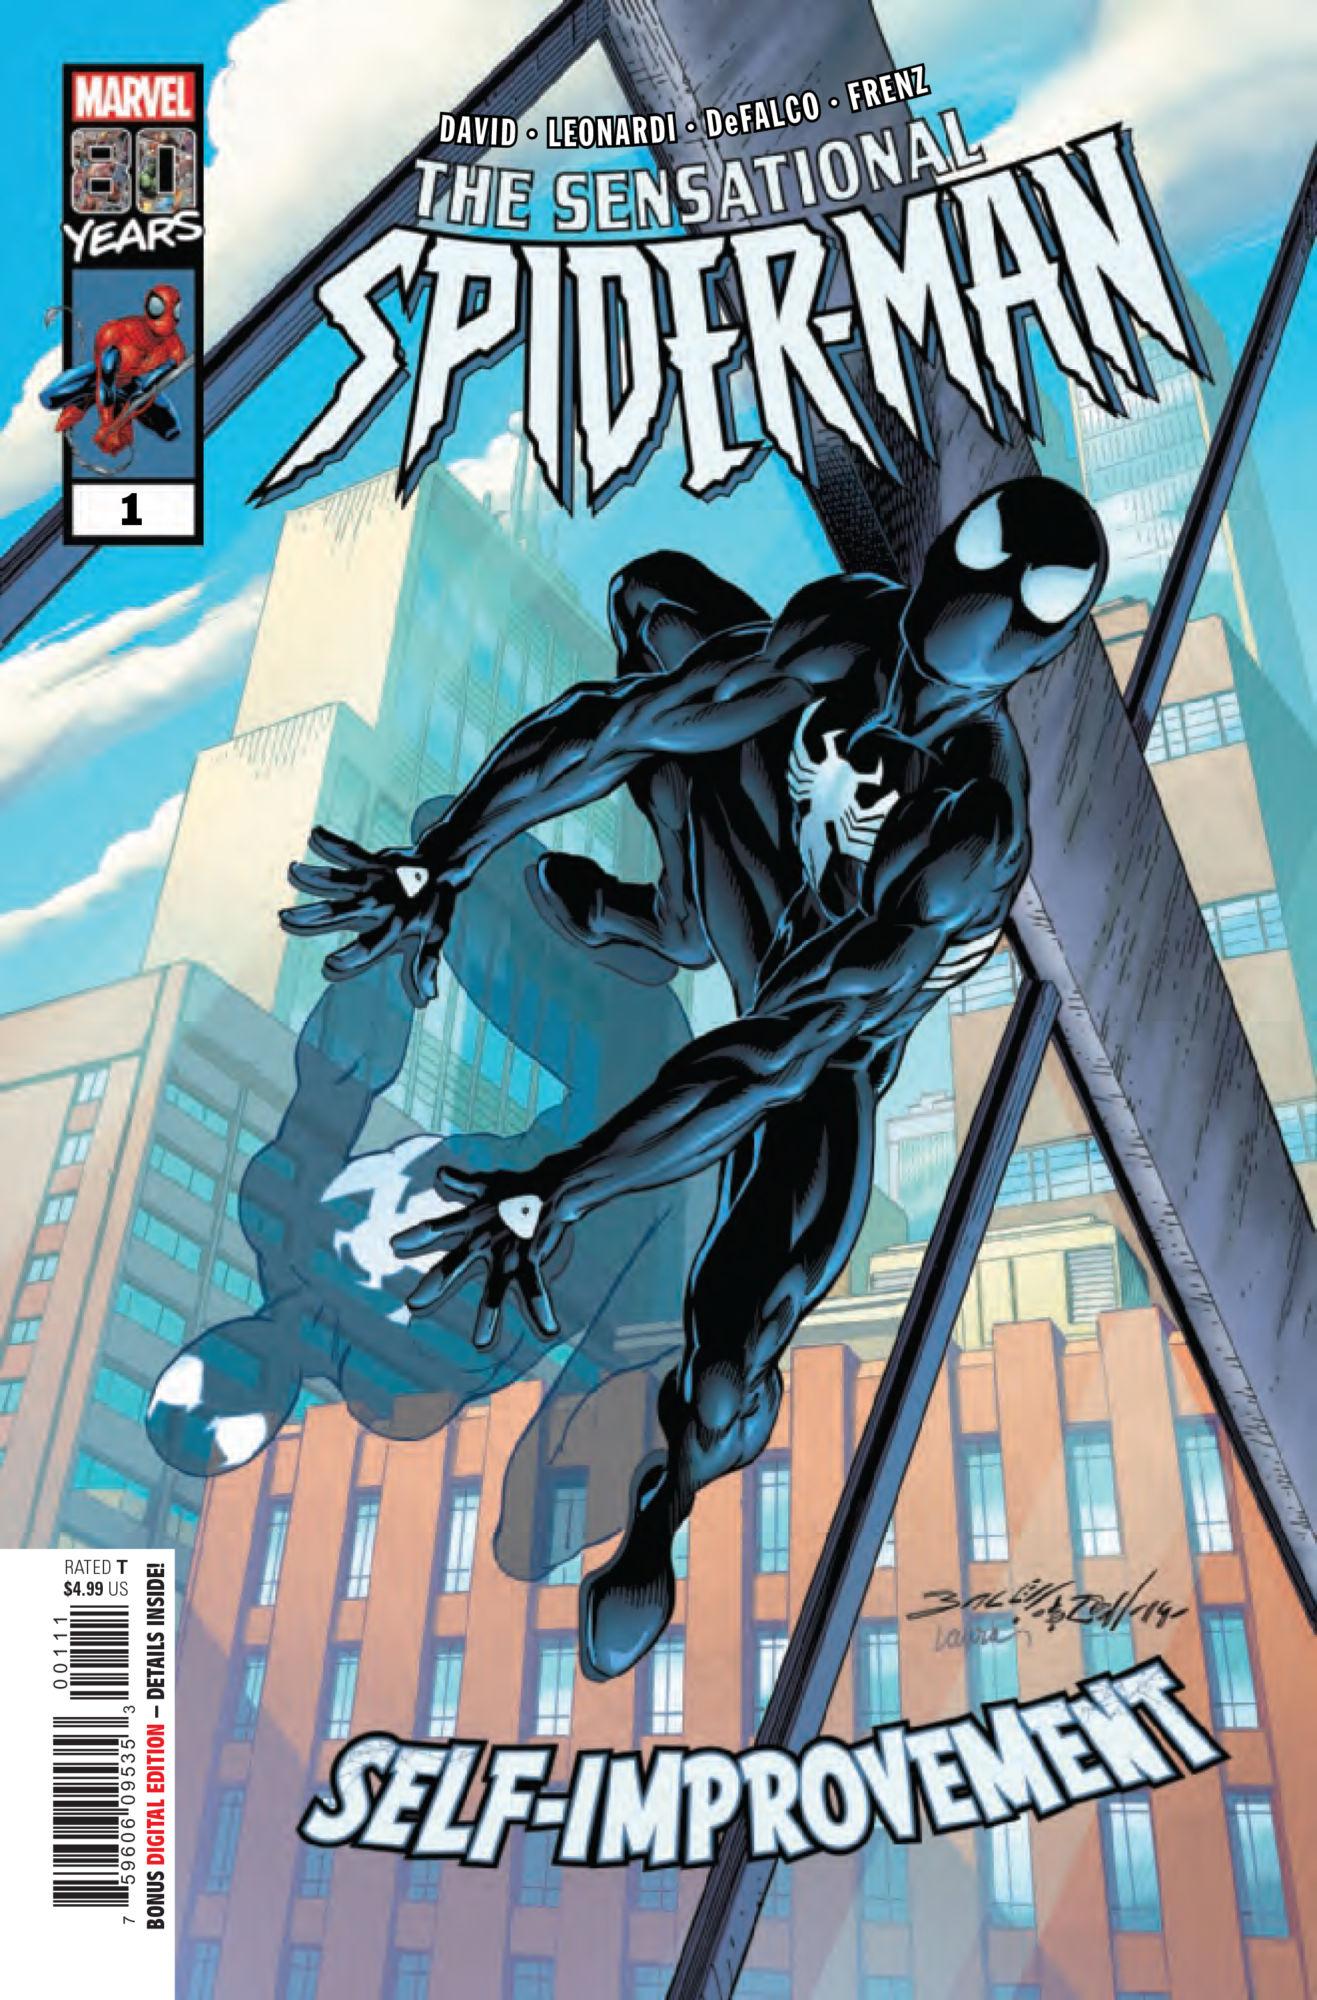 The Original Origin of Spidey's Black Costume in Sensational Spider-Man Self-Improvement [Preview]